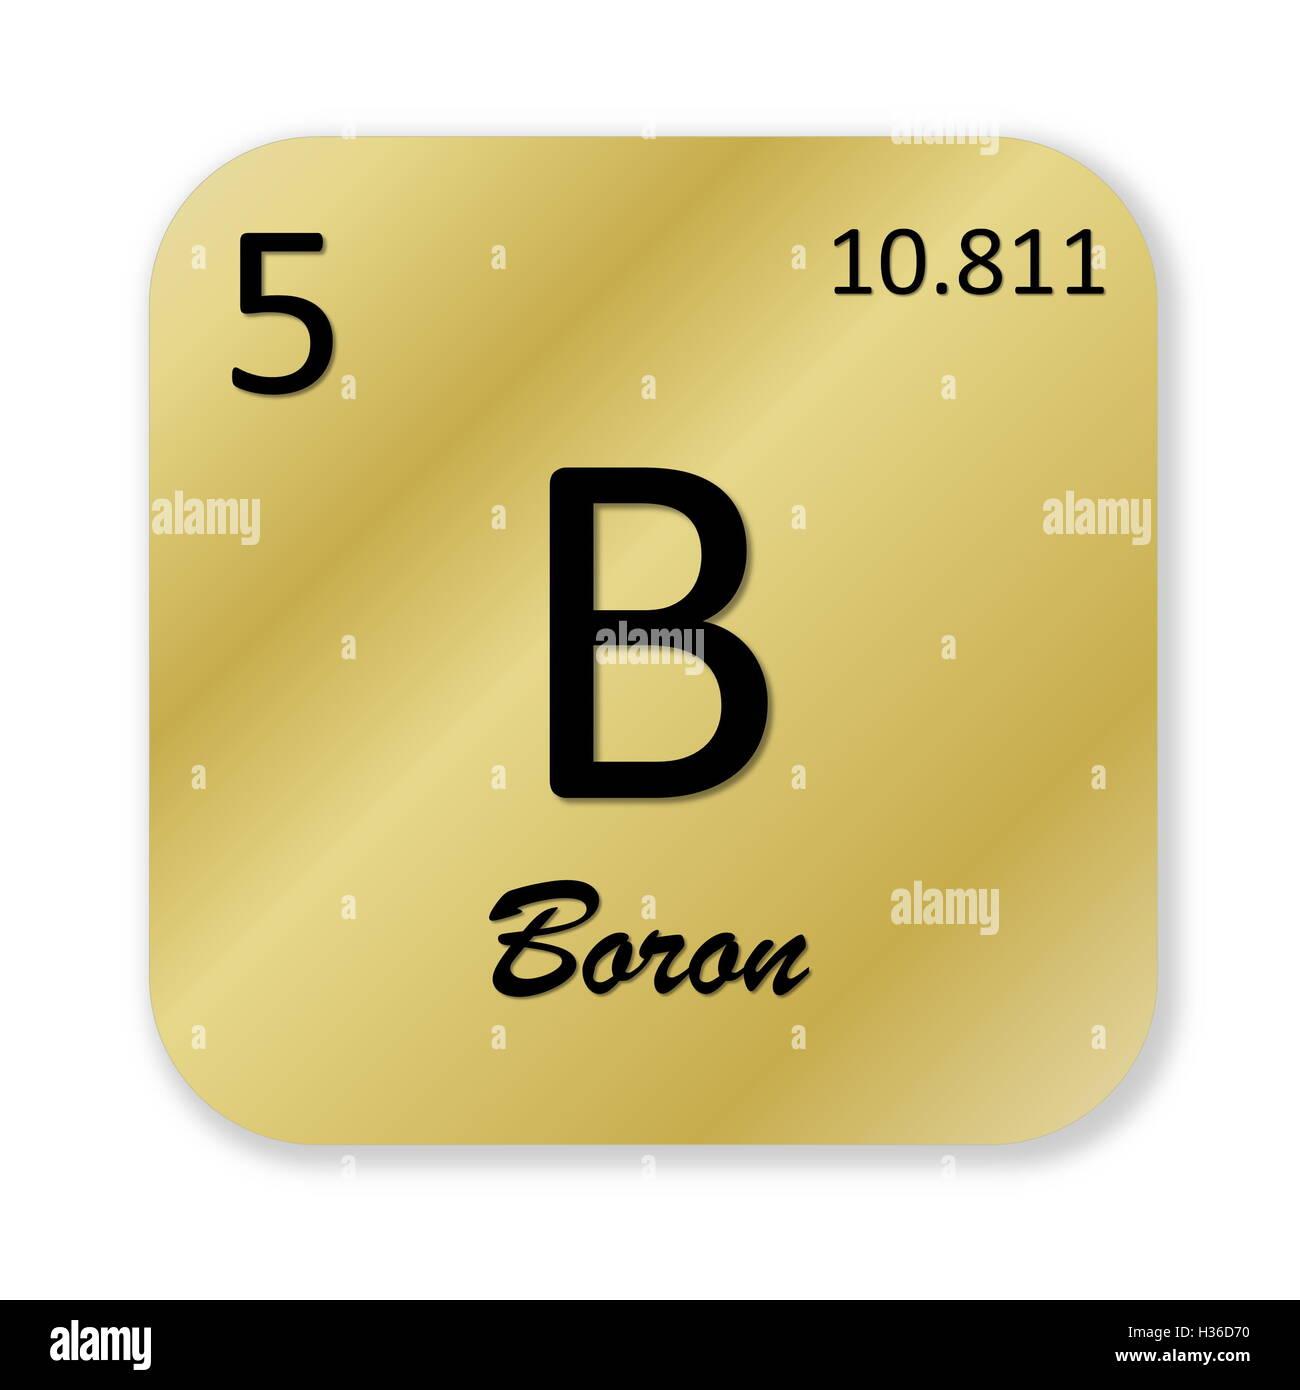 boron element stock photos amp boron element stock images